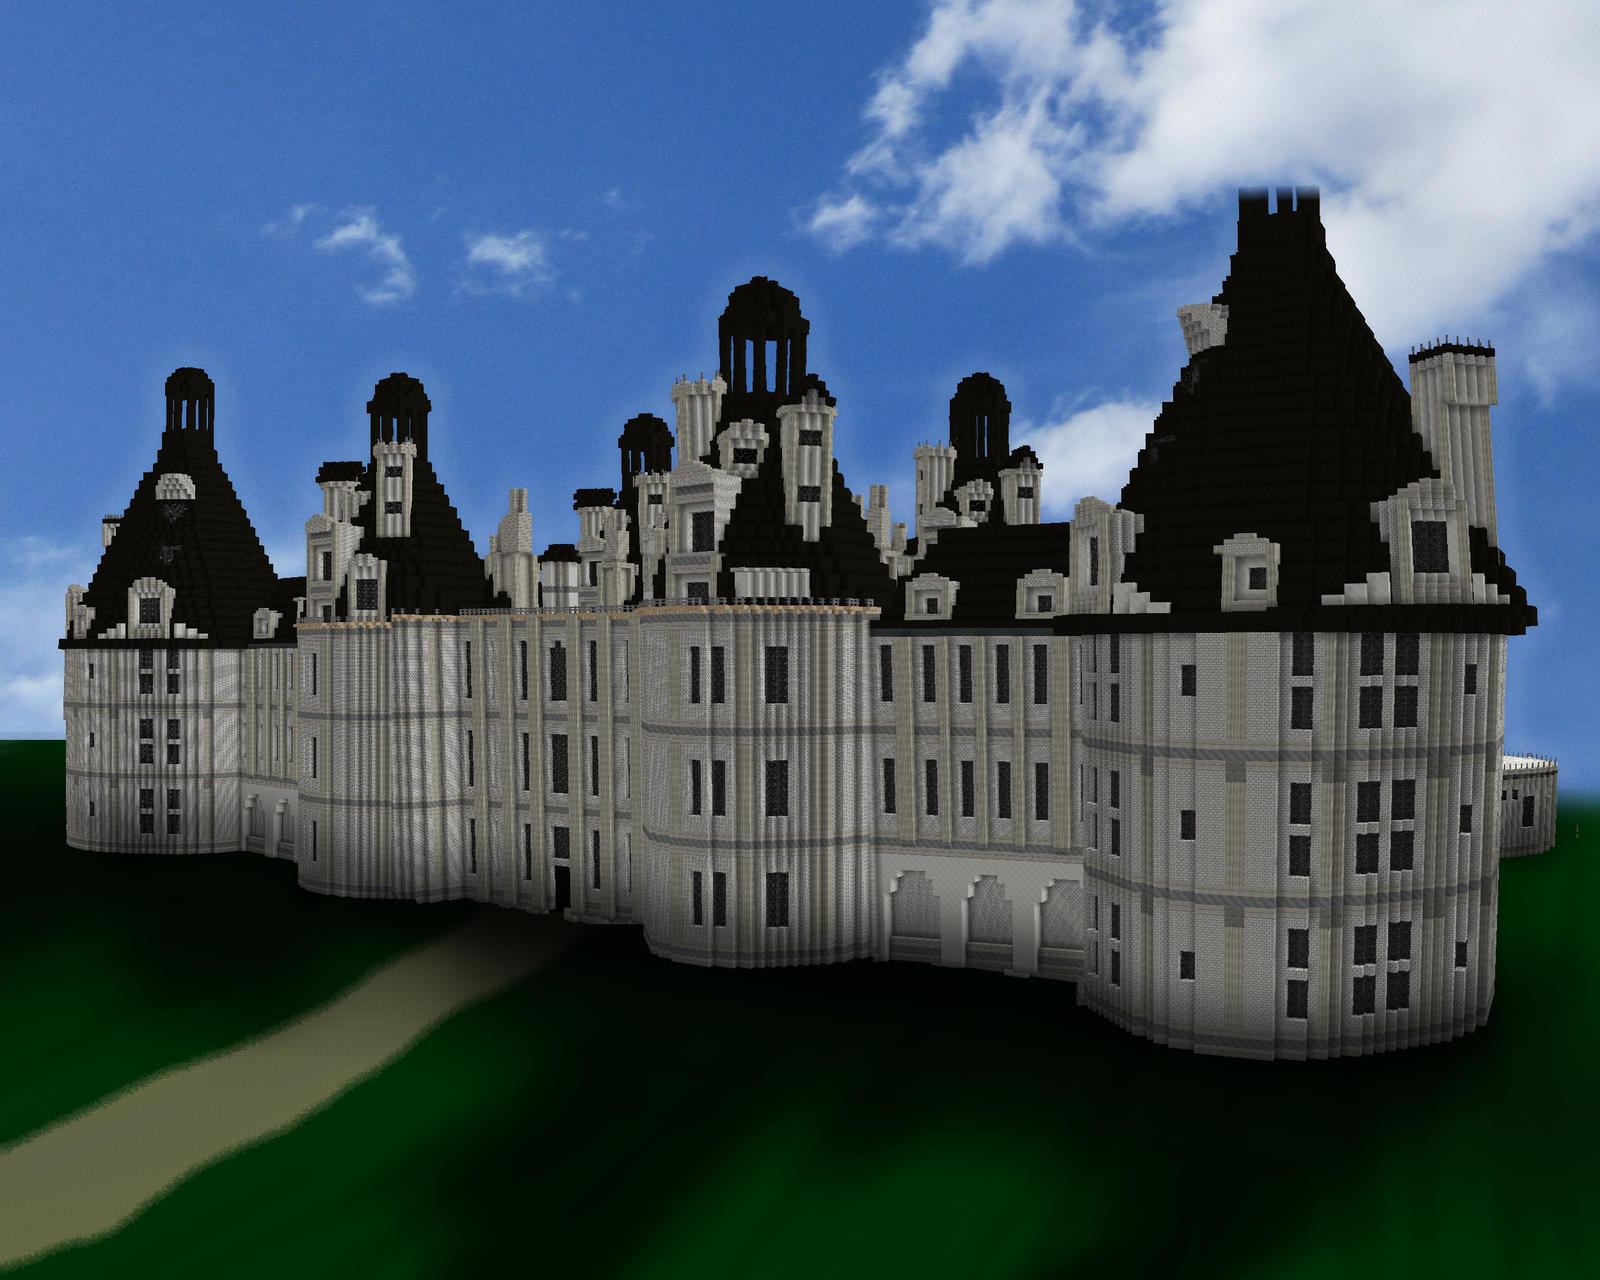 Minecraft chateau de chambord by skysworld on deviantart - Chateau de minecraft ...